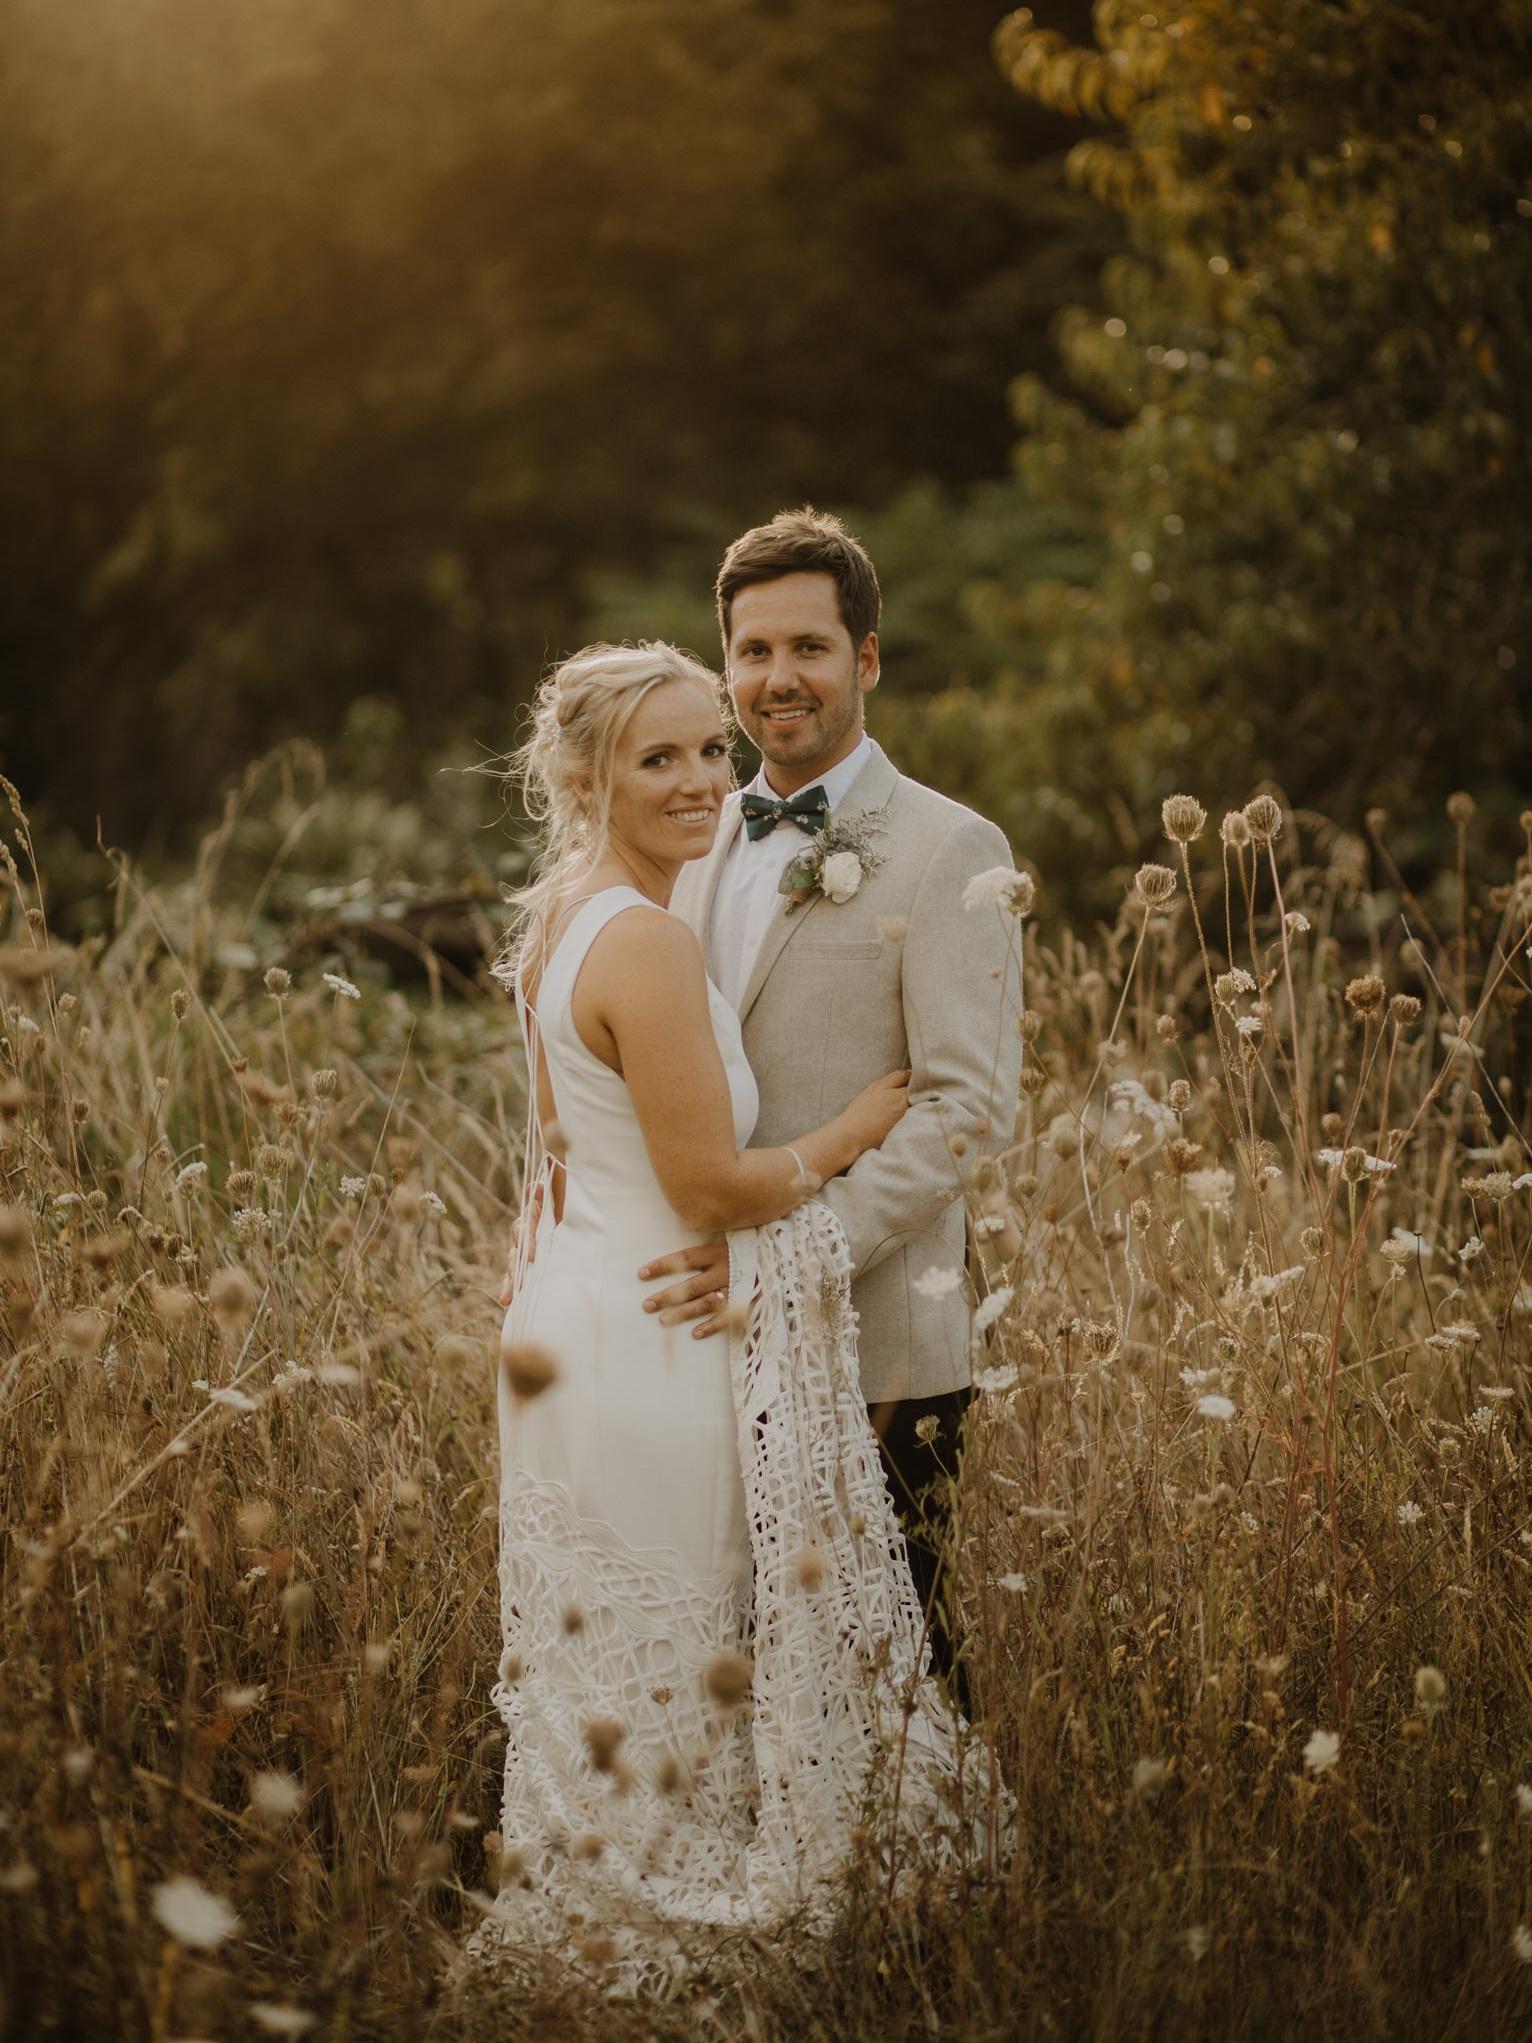 oldforestschool-wedding-blog-161.jpg